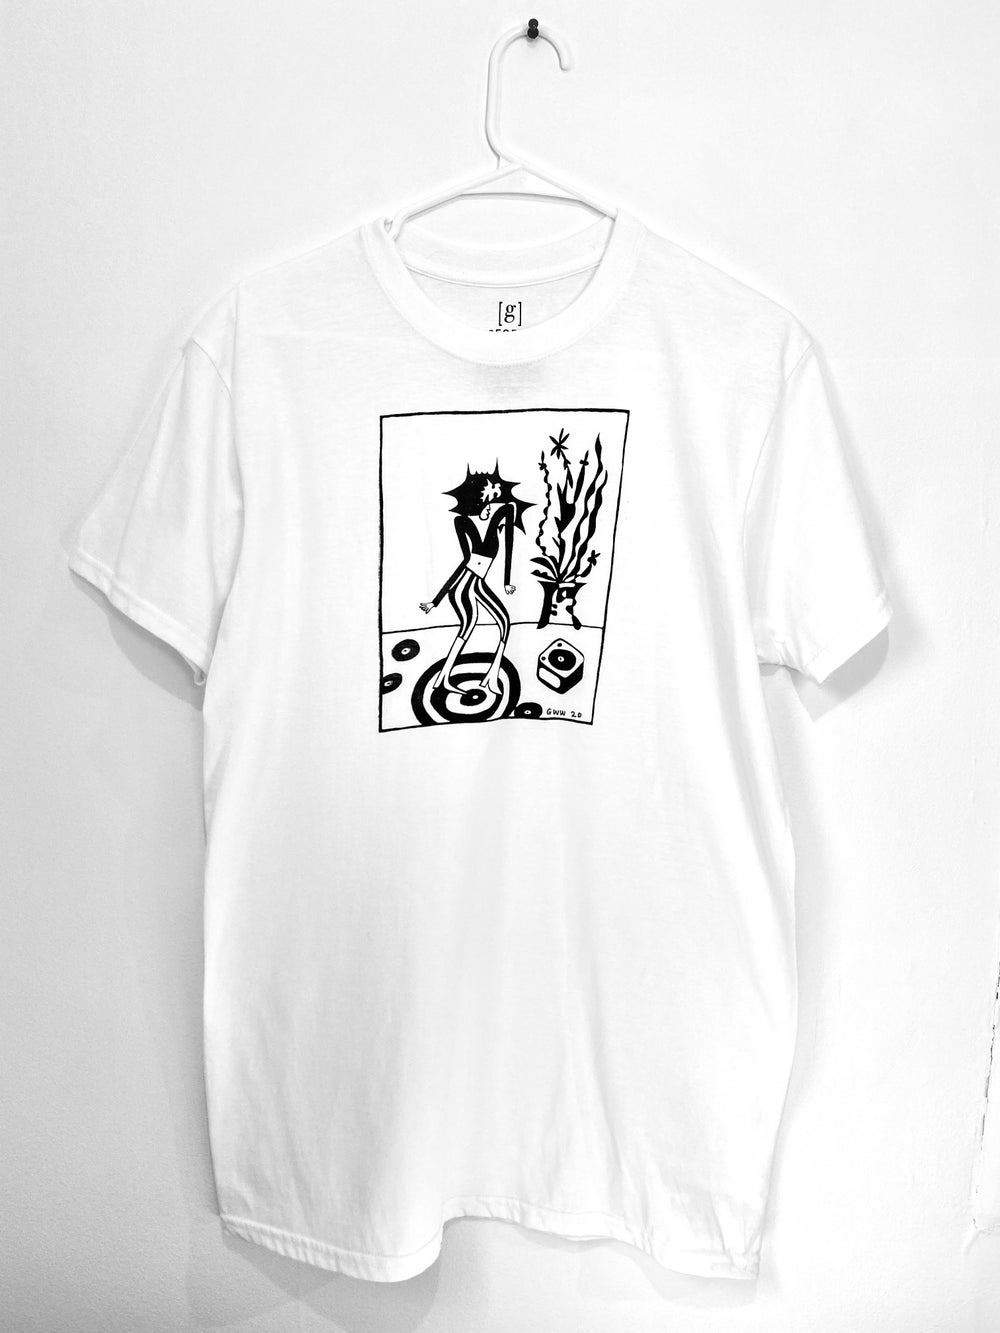 Disco Queen Shirt